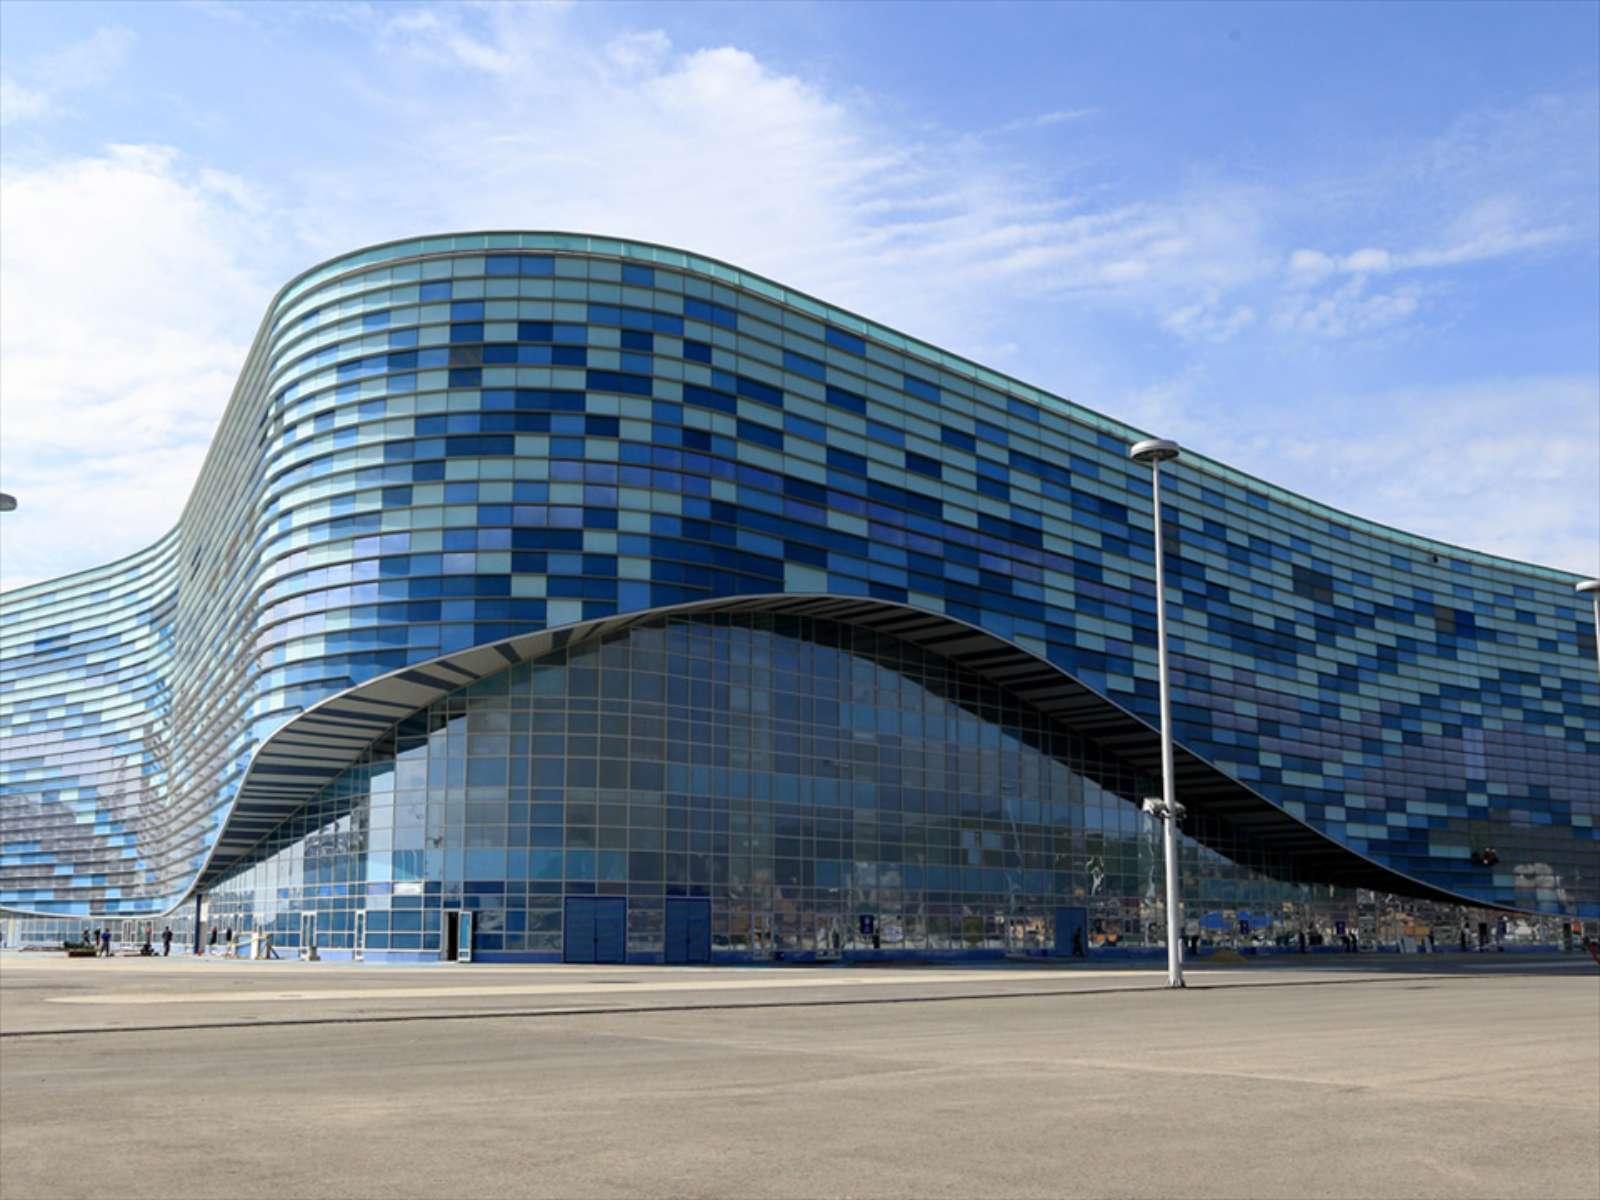 10-Sochi-2014-Olympics-Architecture-Iceberg-Skating-Palace